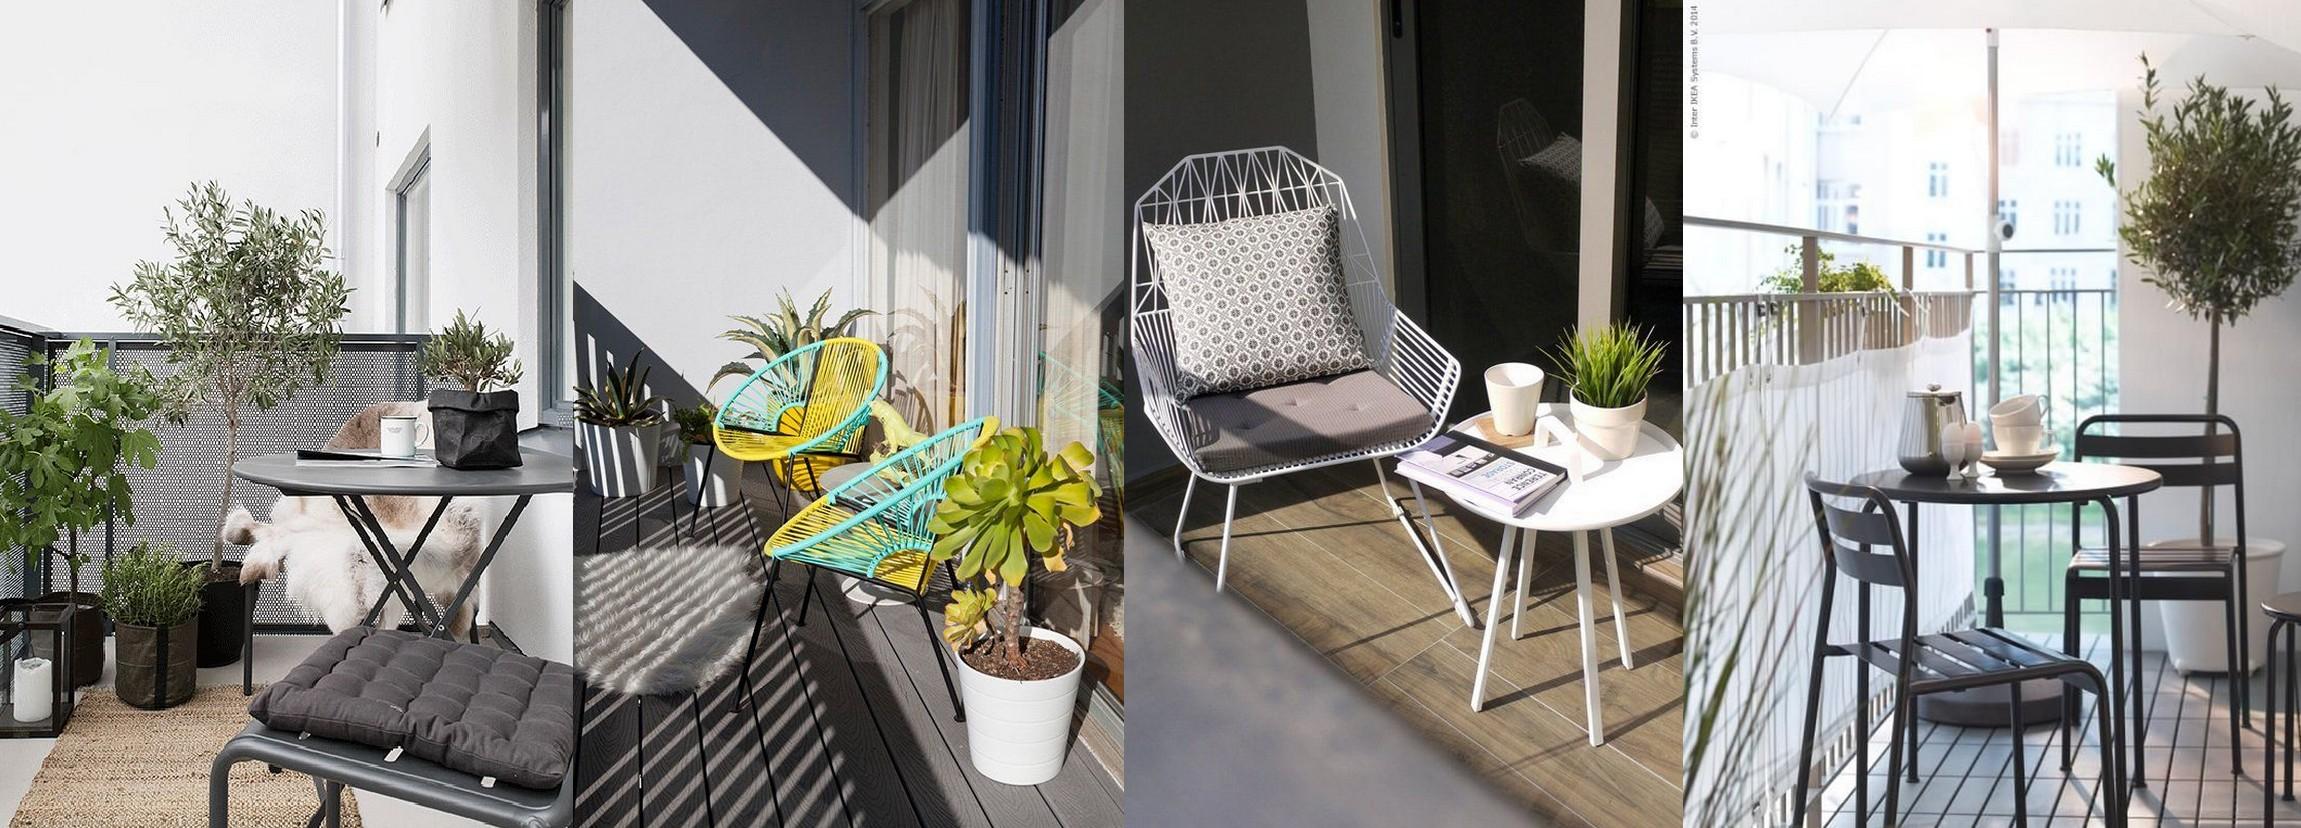 Balcon (tables chaises).jpg